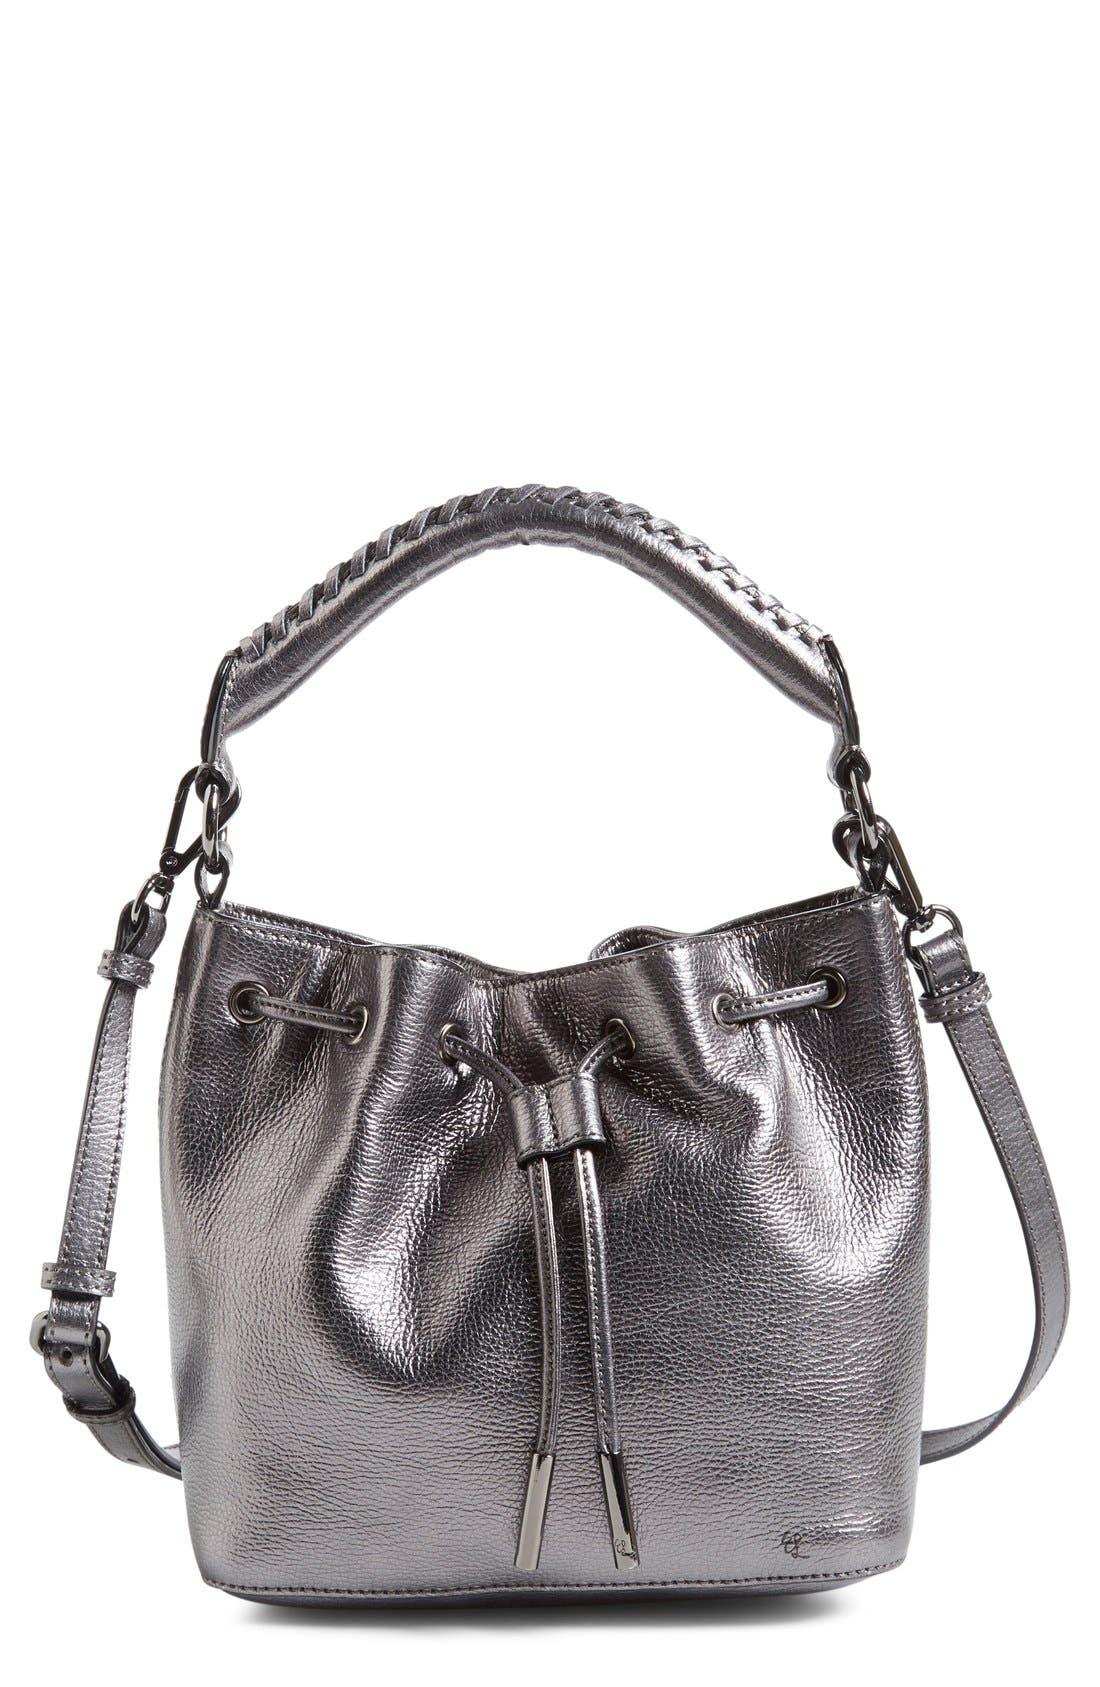 Main Image - Elliott Lucca 'Gigi Bon Bon' Leather Bucket Bag